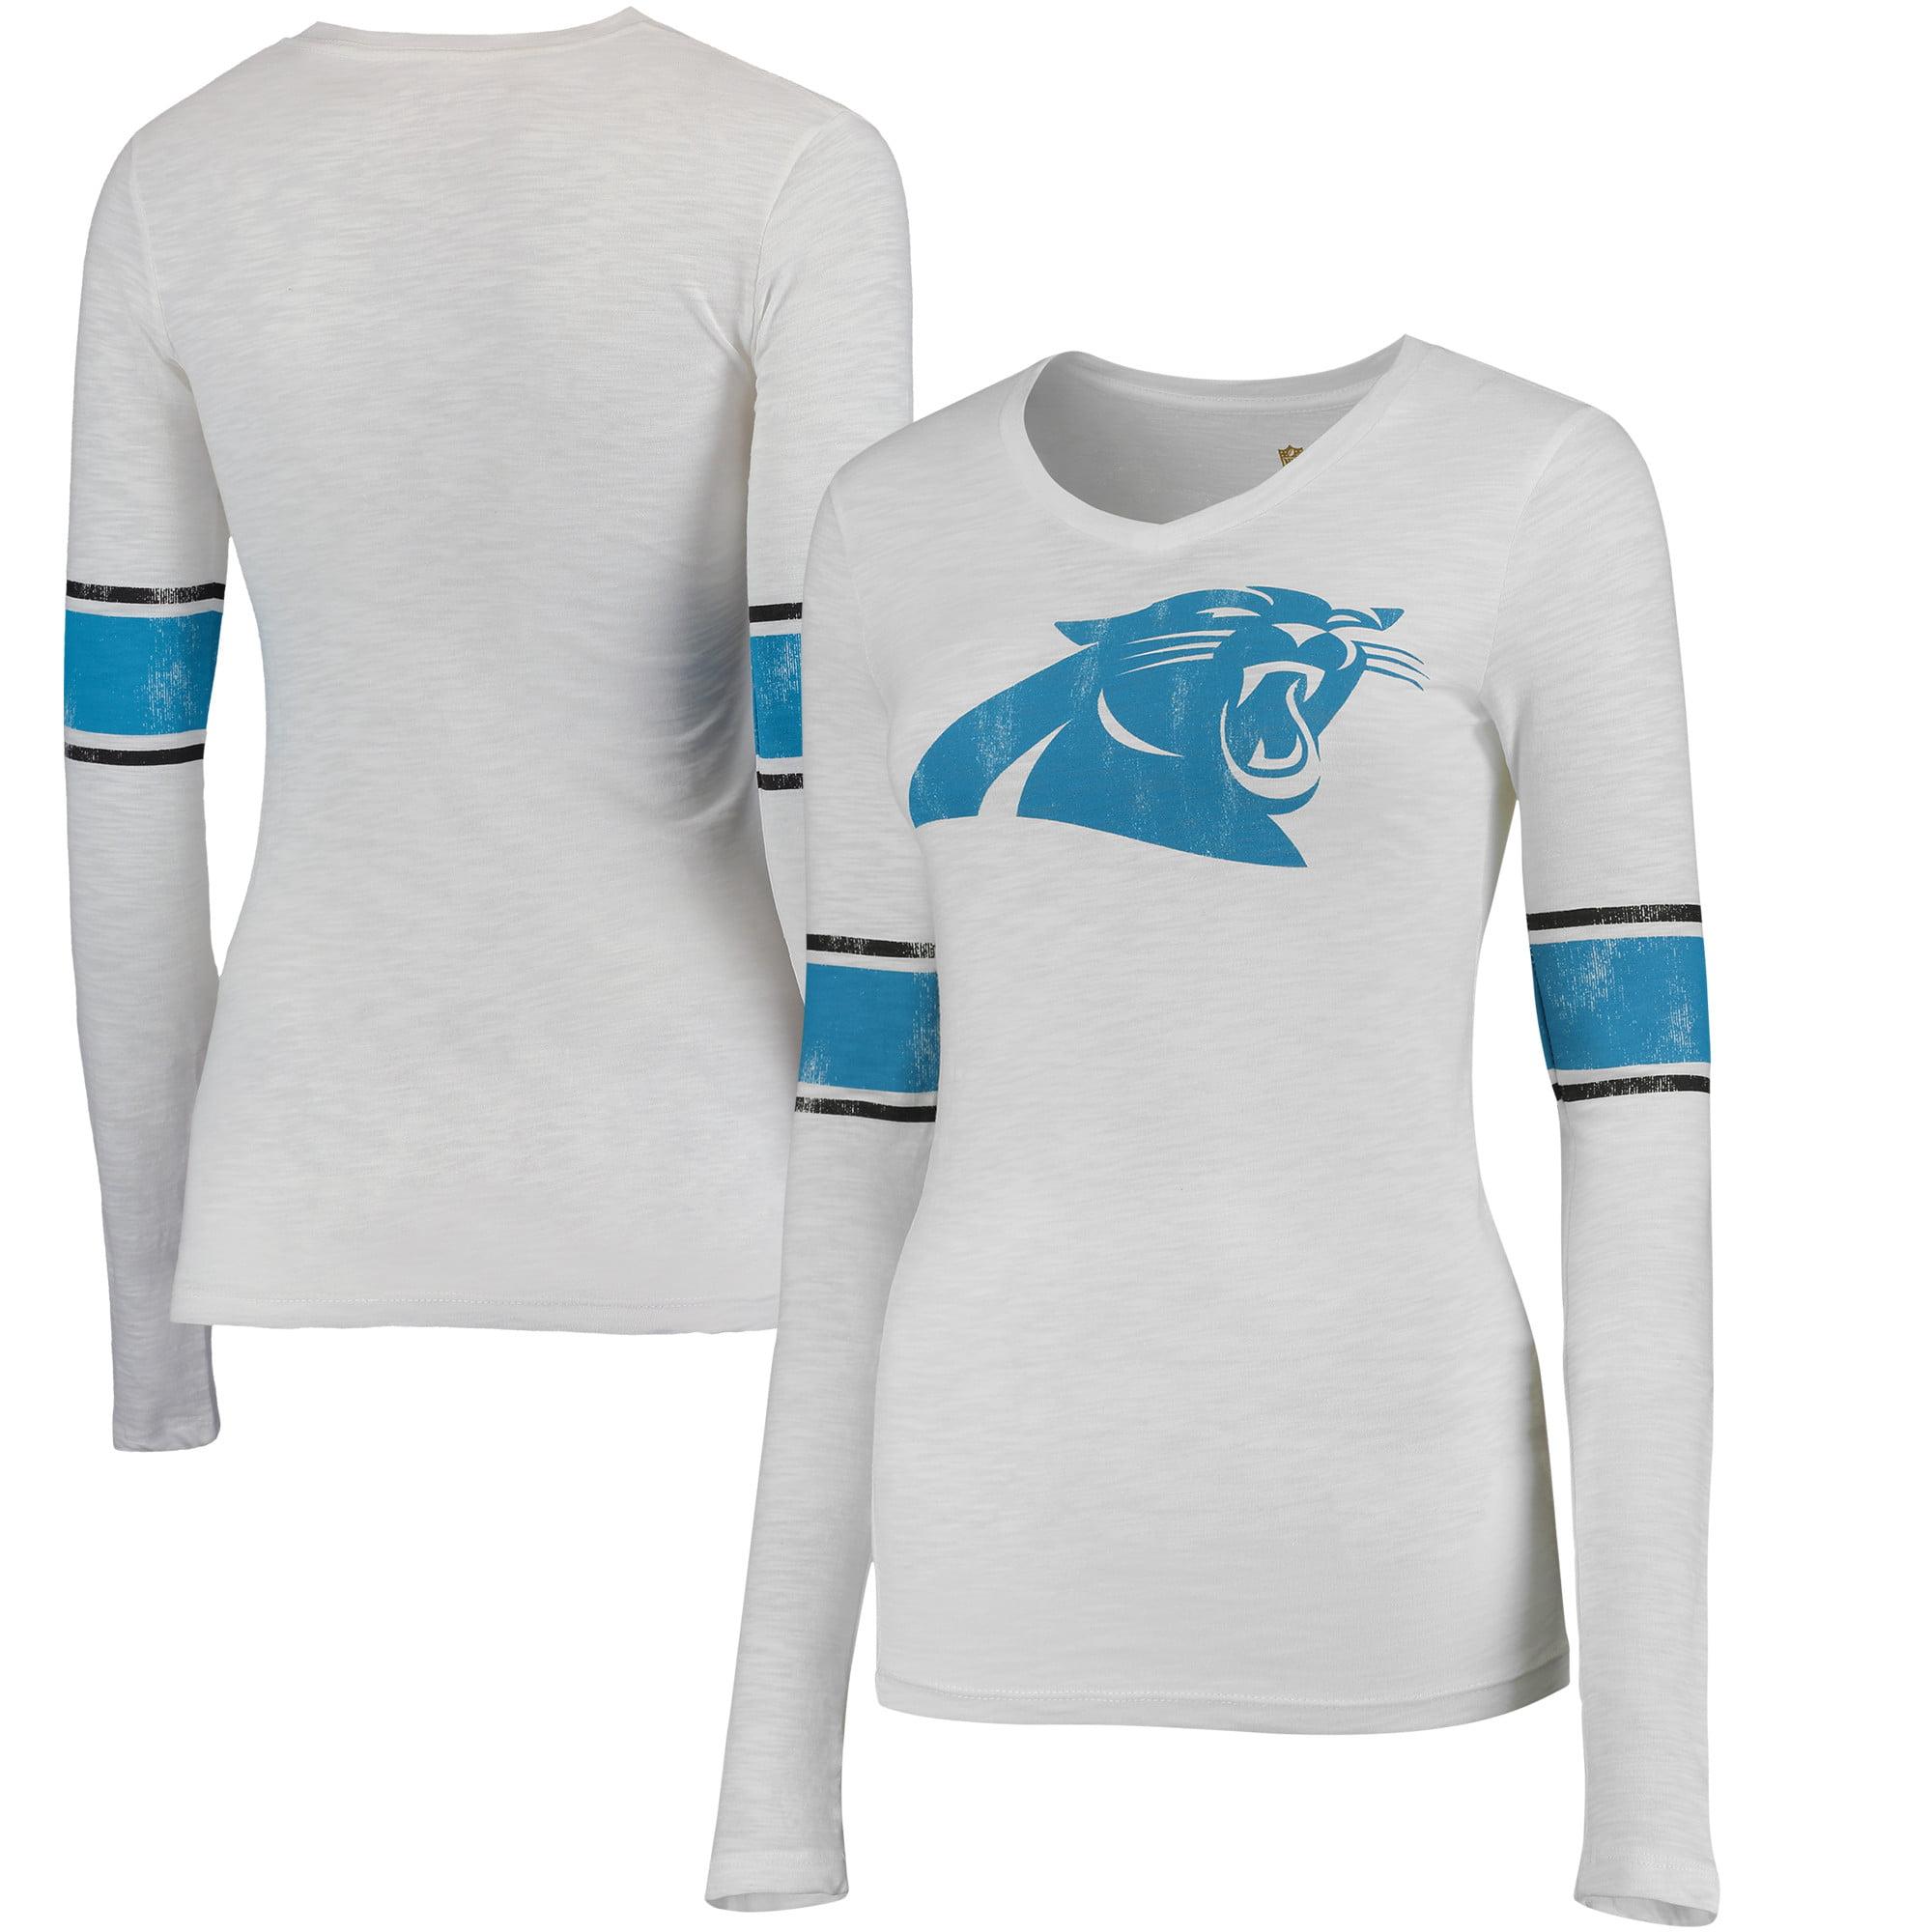 Carolina Panthers Juniors Team Leader V-Neck Long Sleeve T-Shirt - White